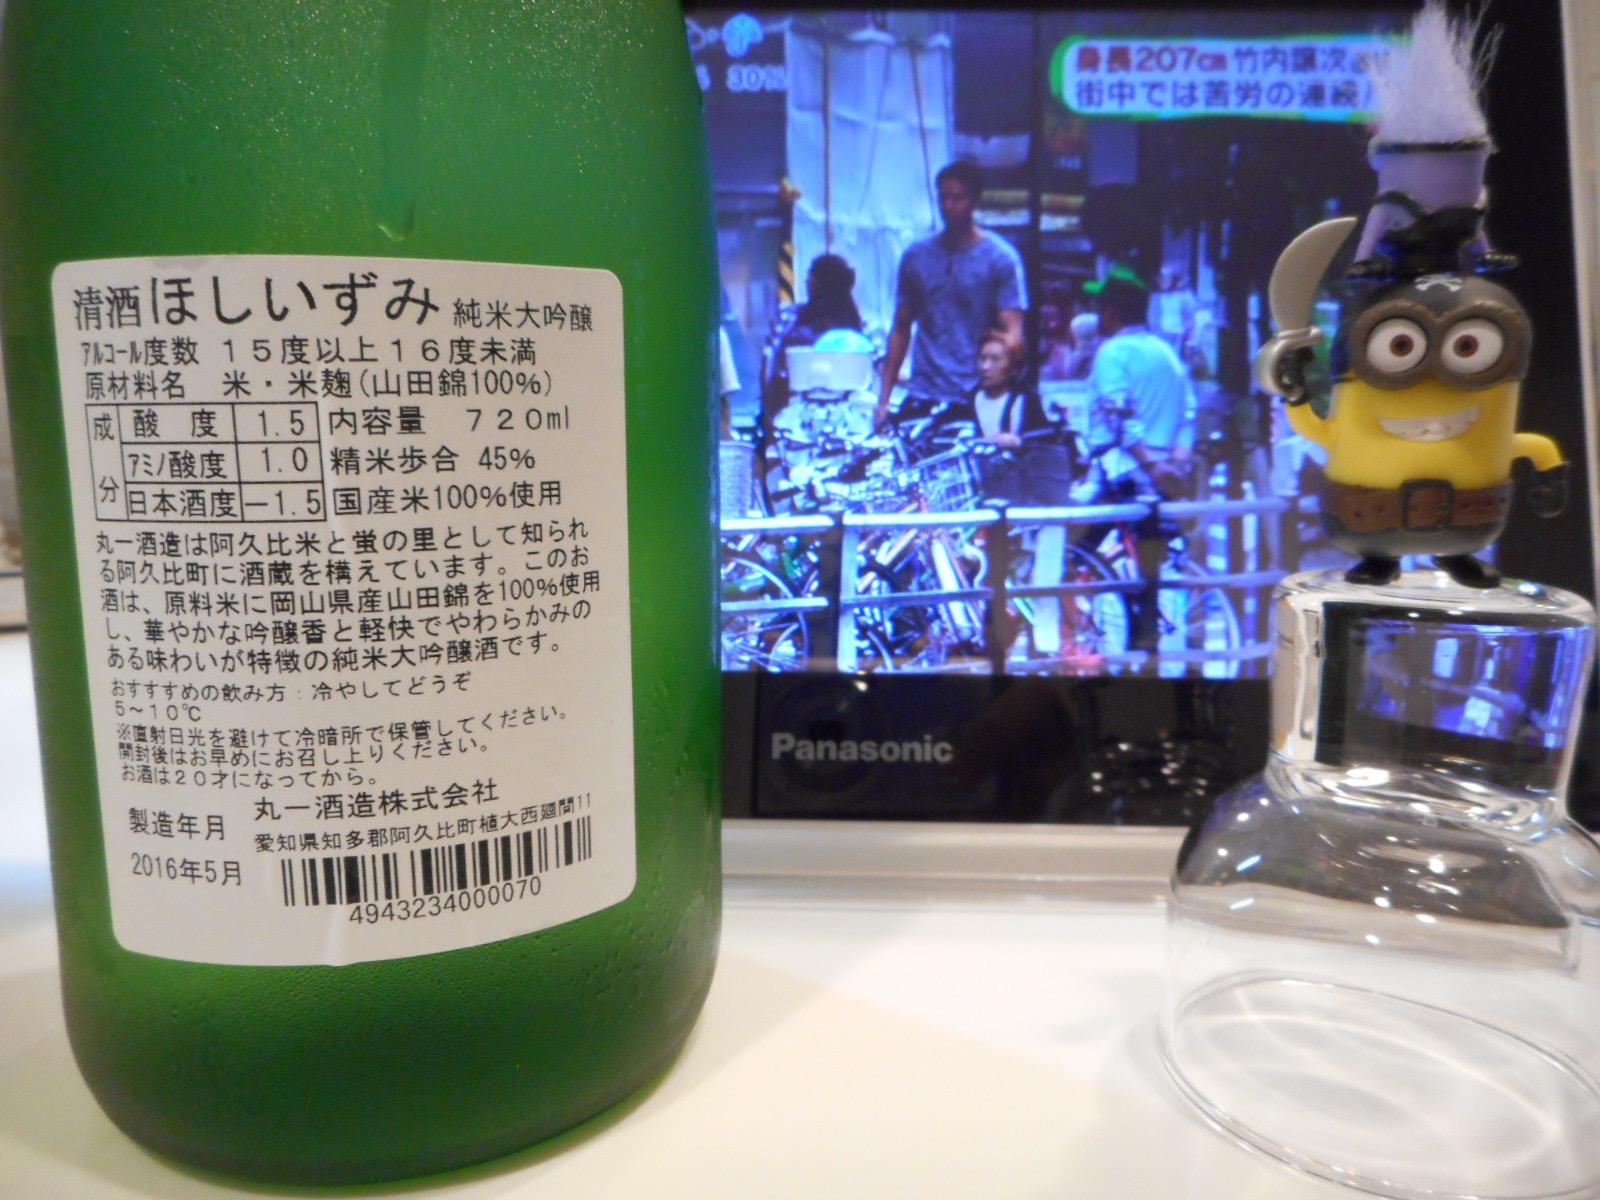 hoshiizumi_jundai_yamada45_27by2.jpg